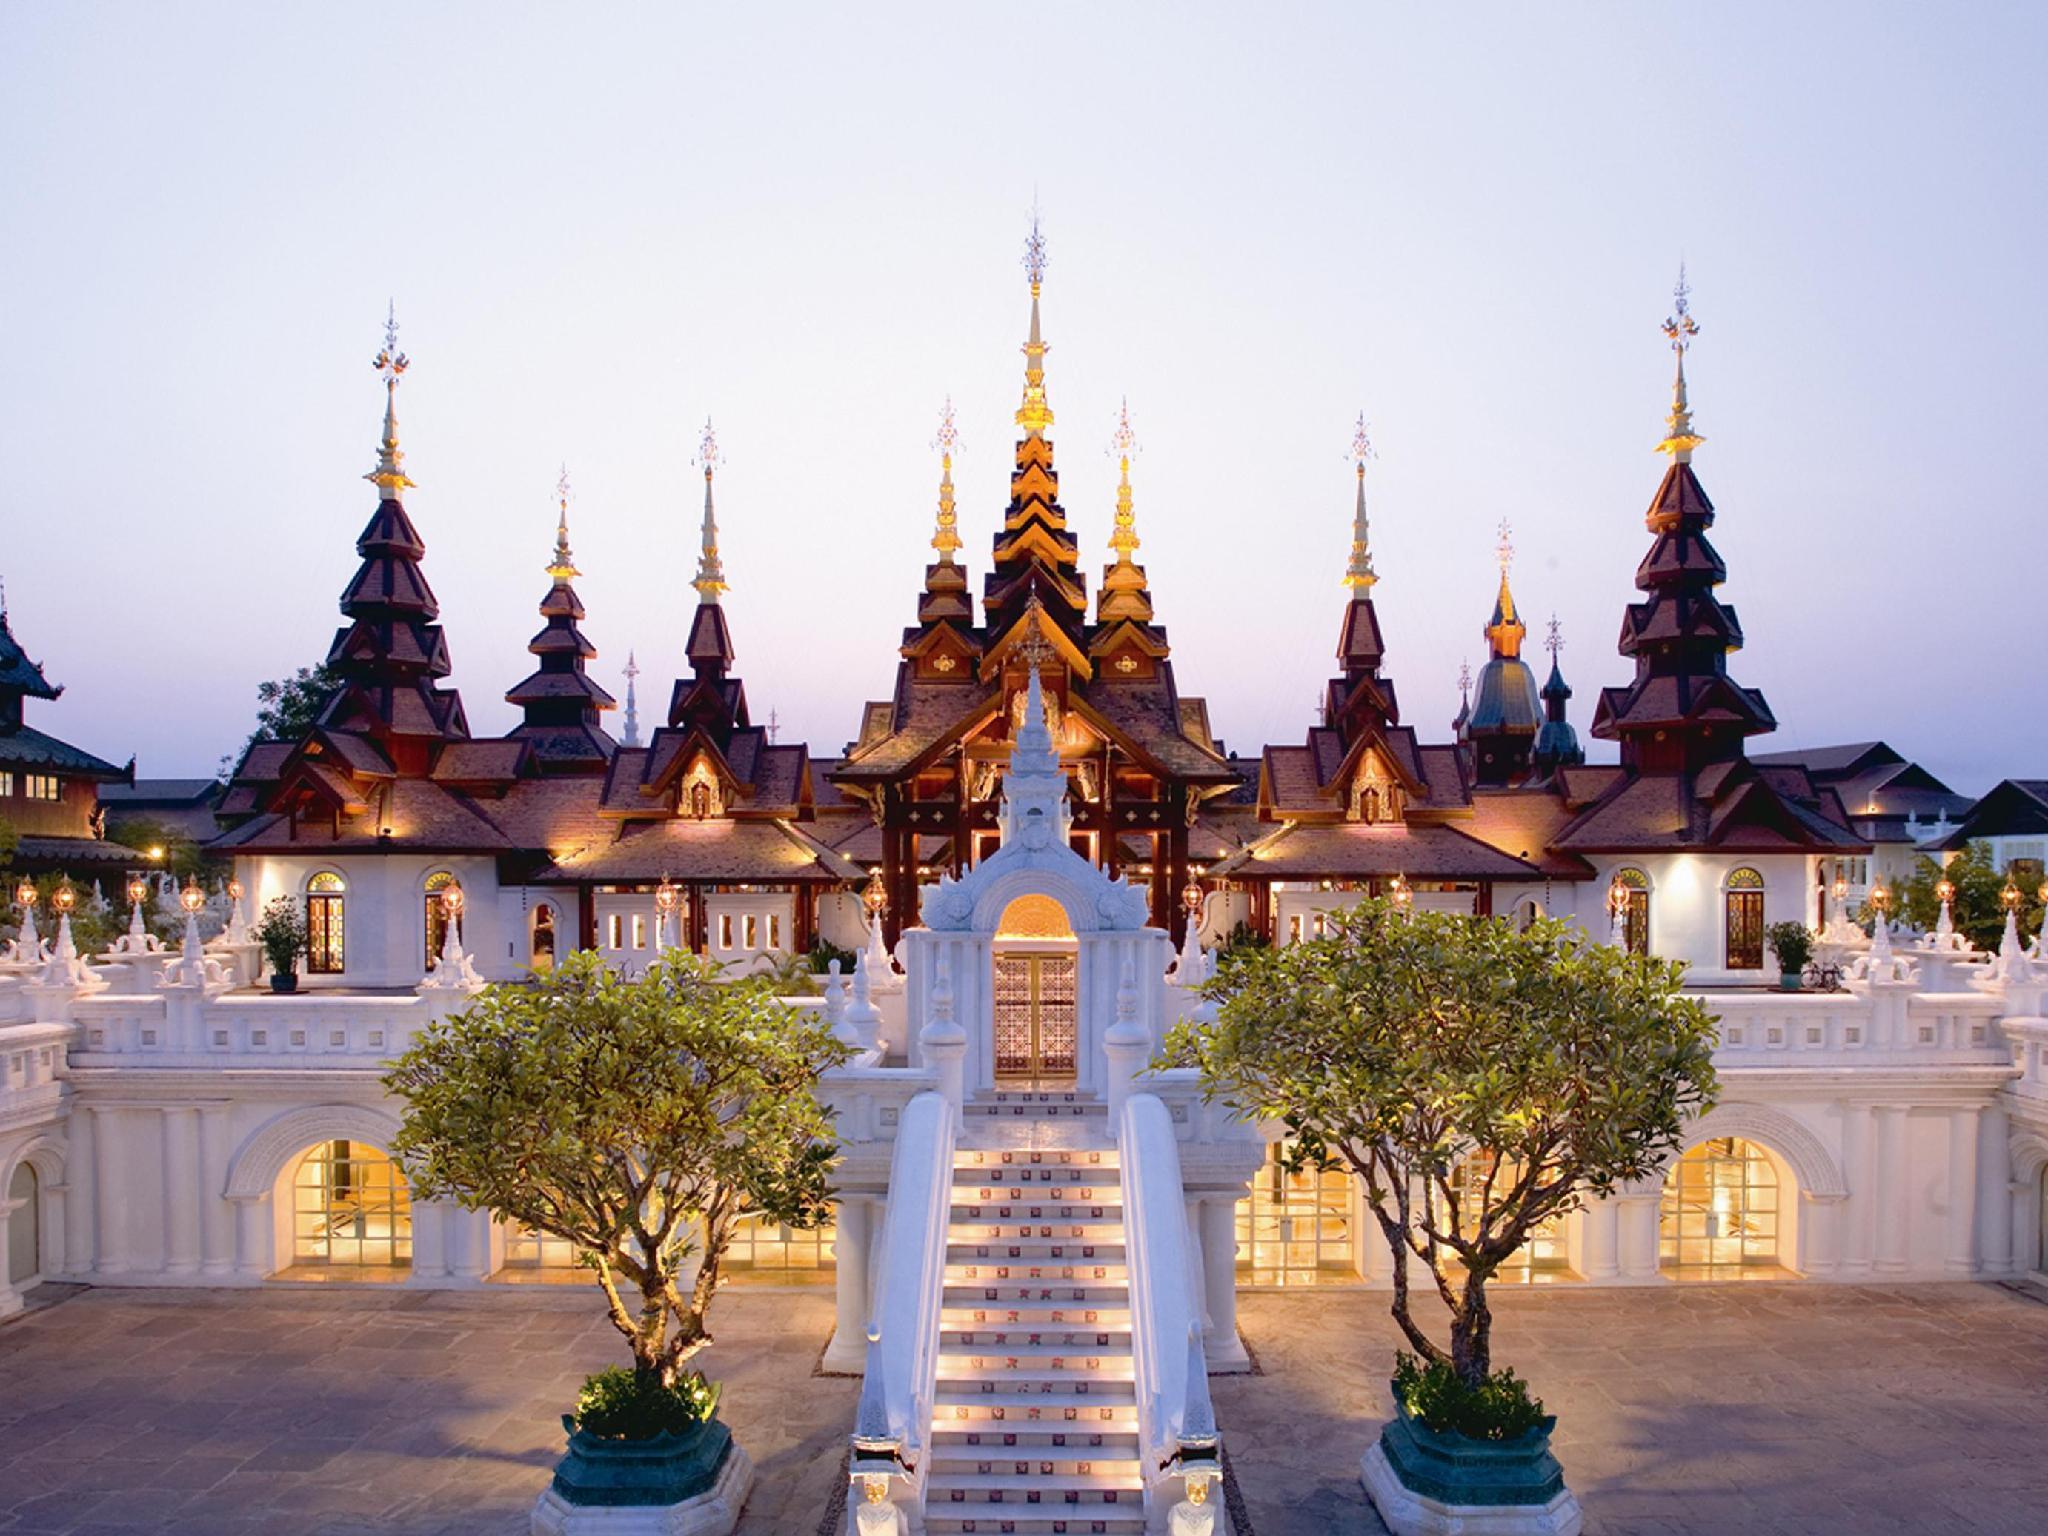 Hotel Murah di Tha Sala Chiang Mai - The Dhara Dhevi Hotel Chiang Mai